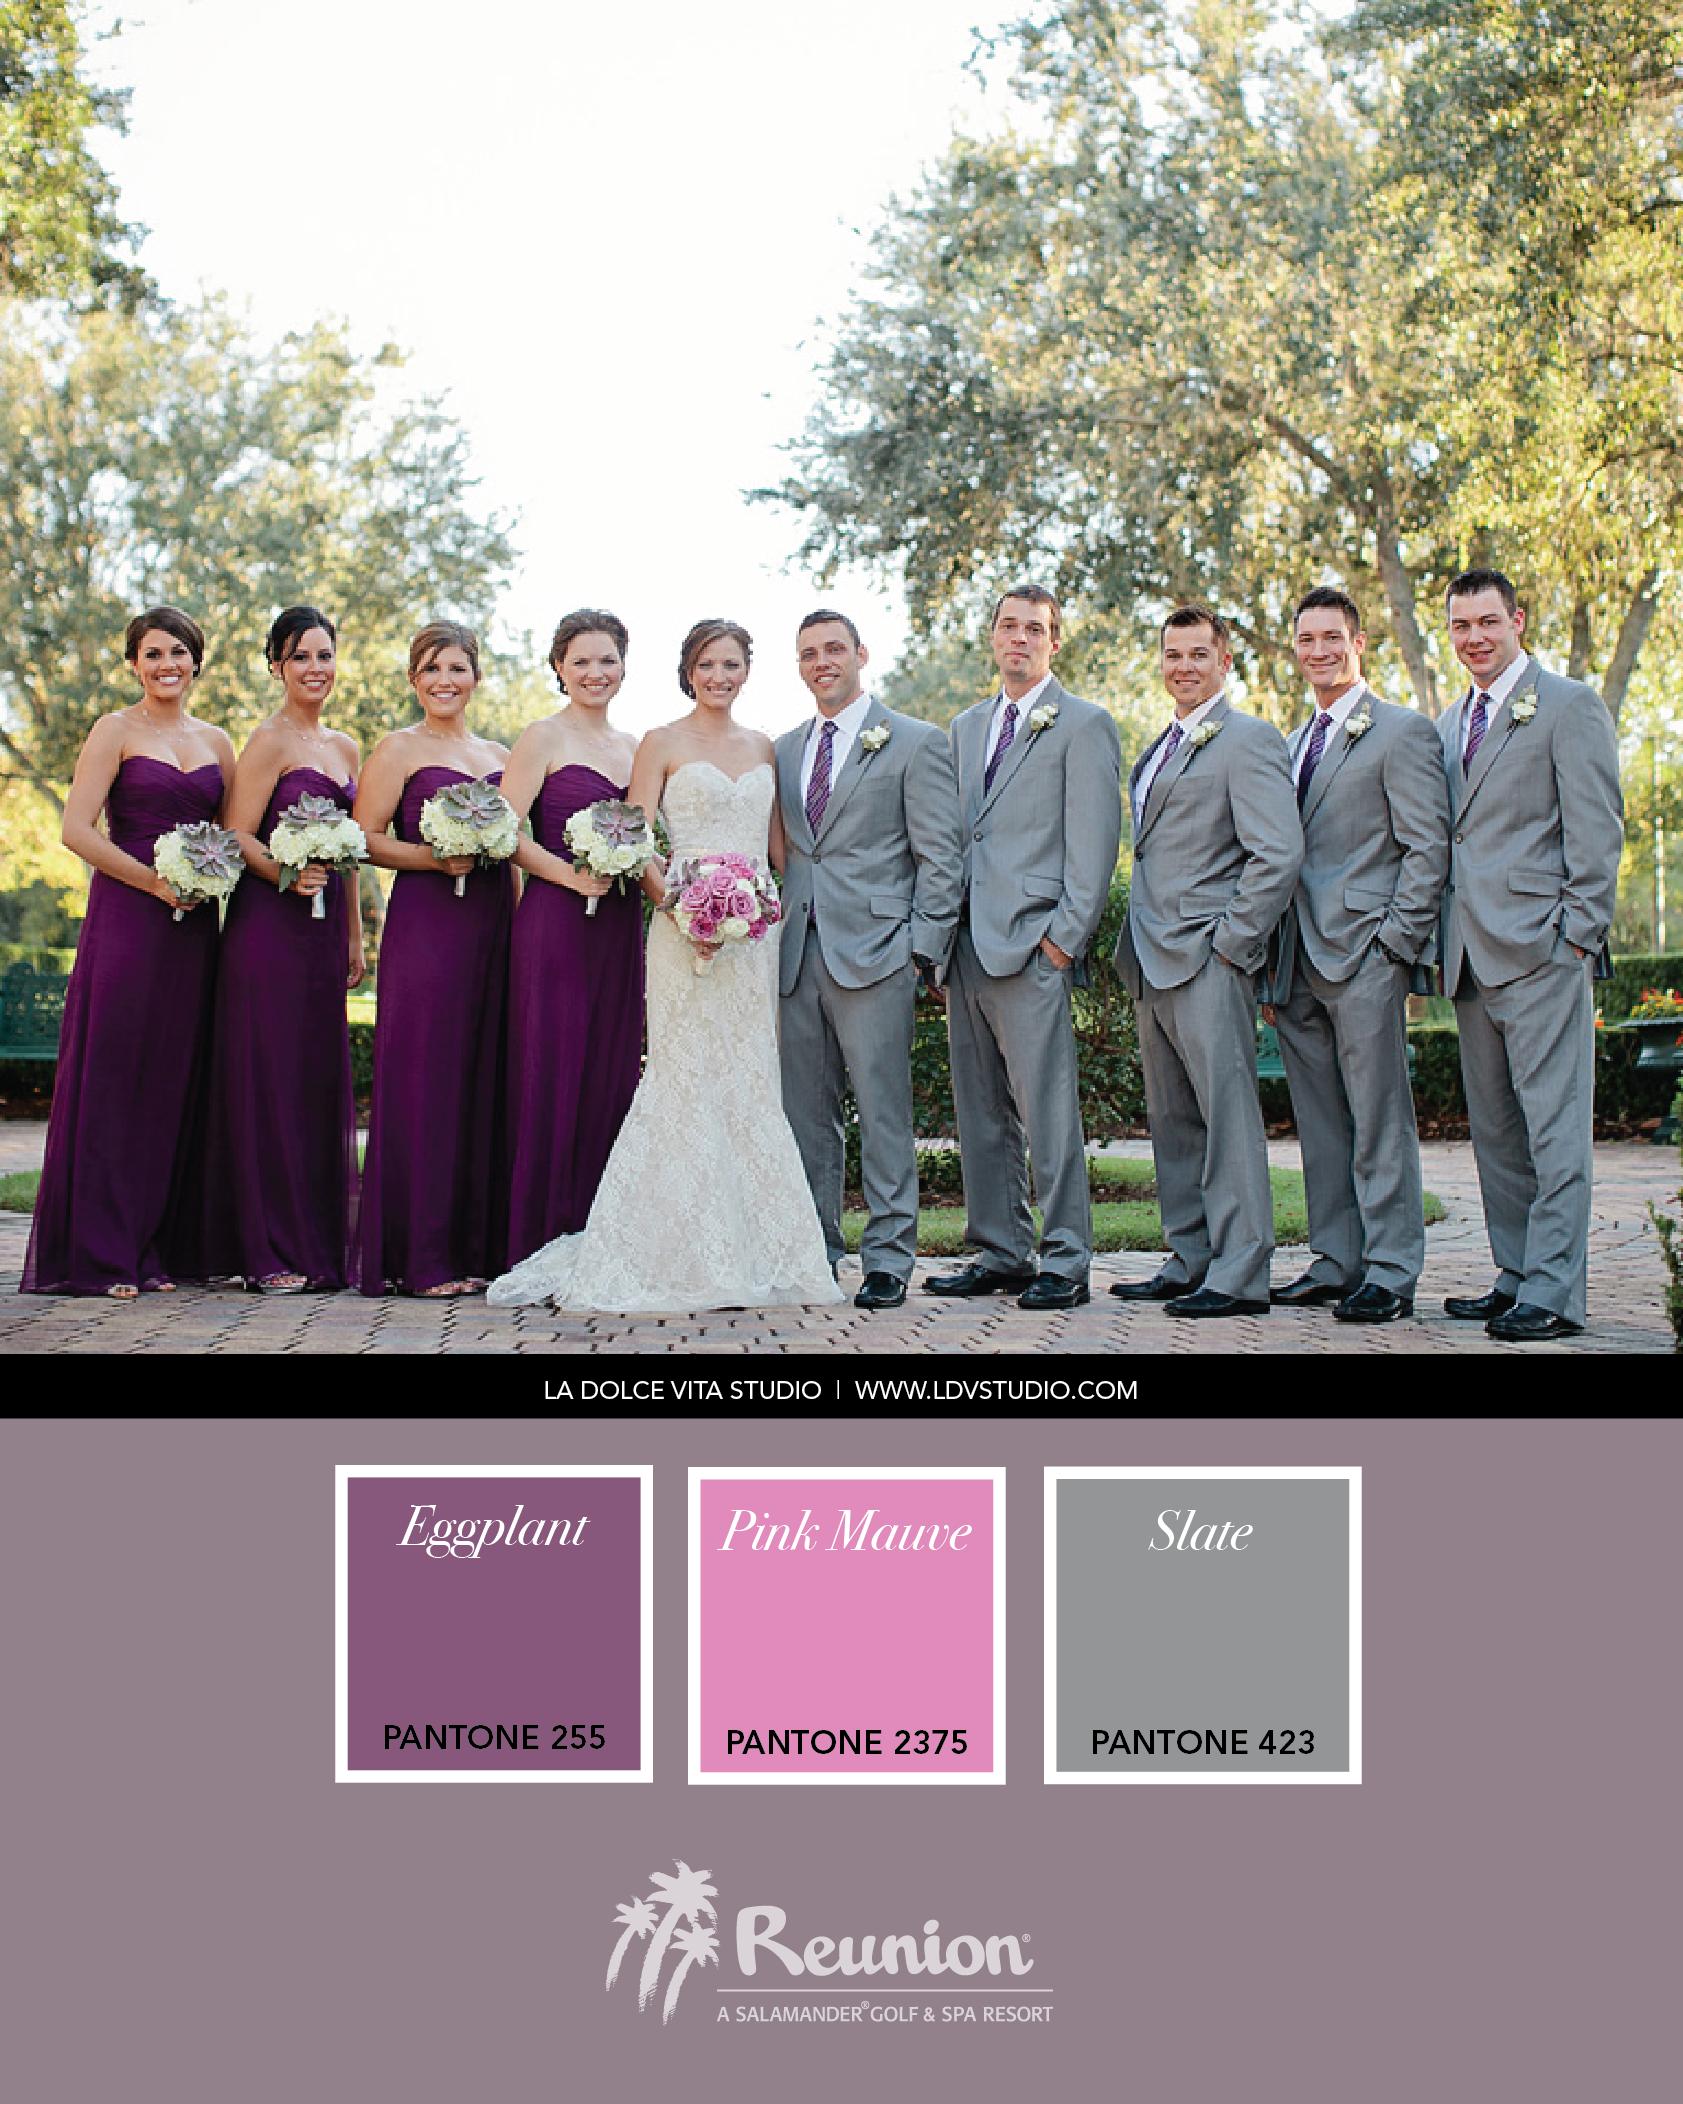 Wedding Color Palette: Purple, Pink & Gray | Pinterest | Pink grey ...